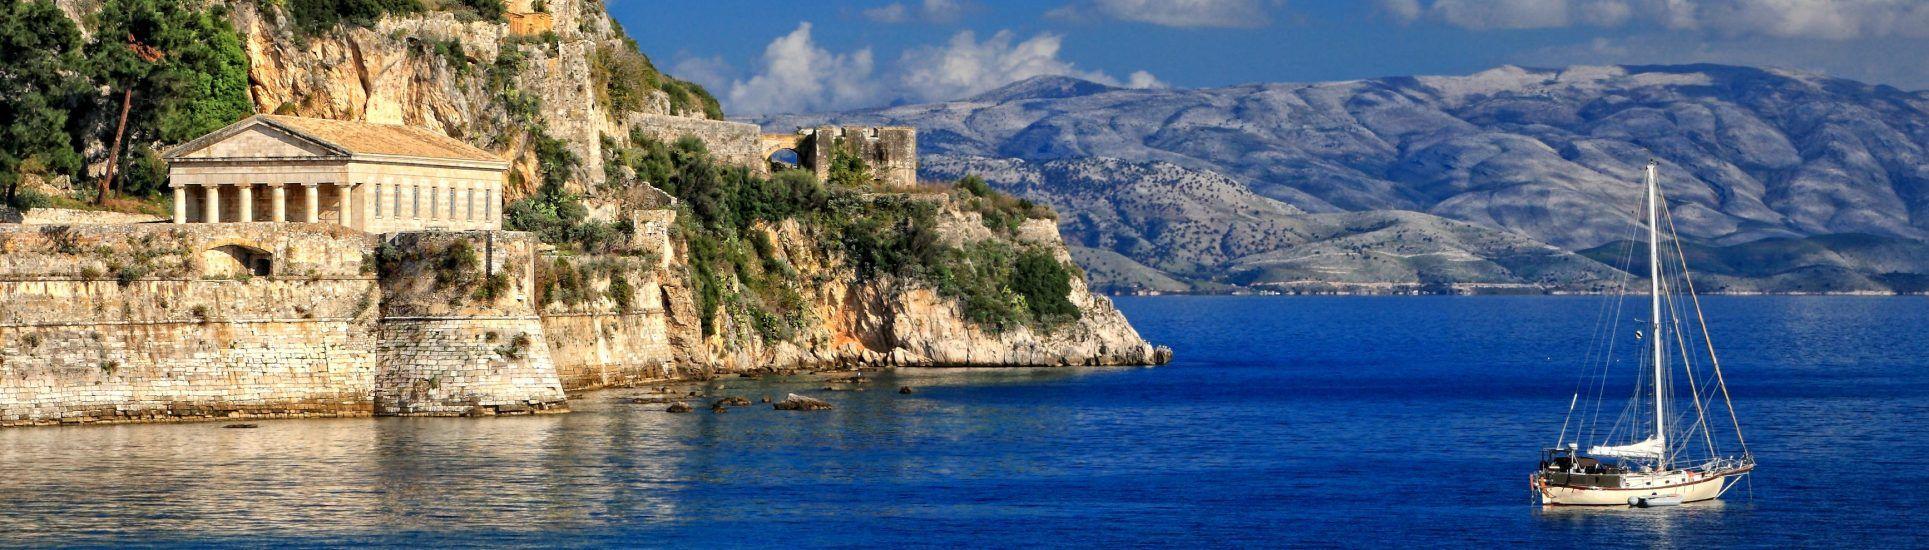 Corfu Luxury Yacht Charter Guide - IYC